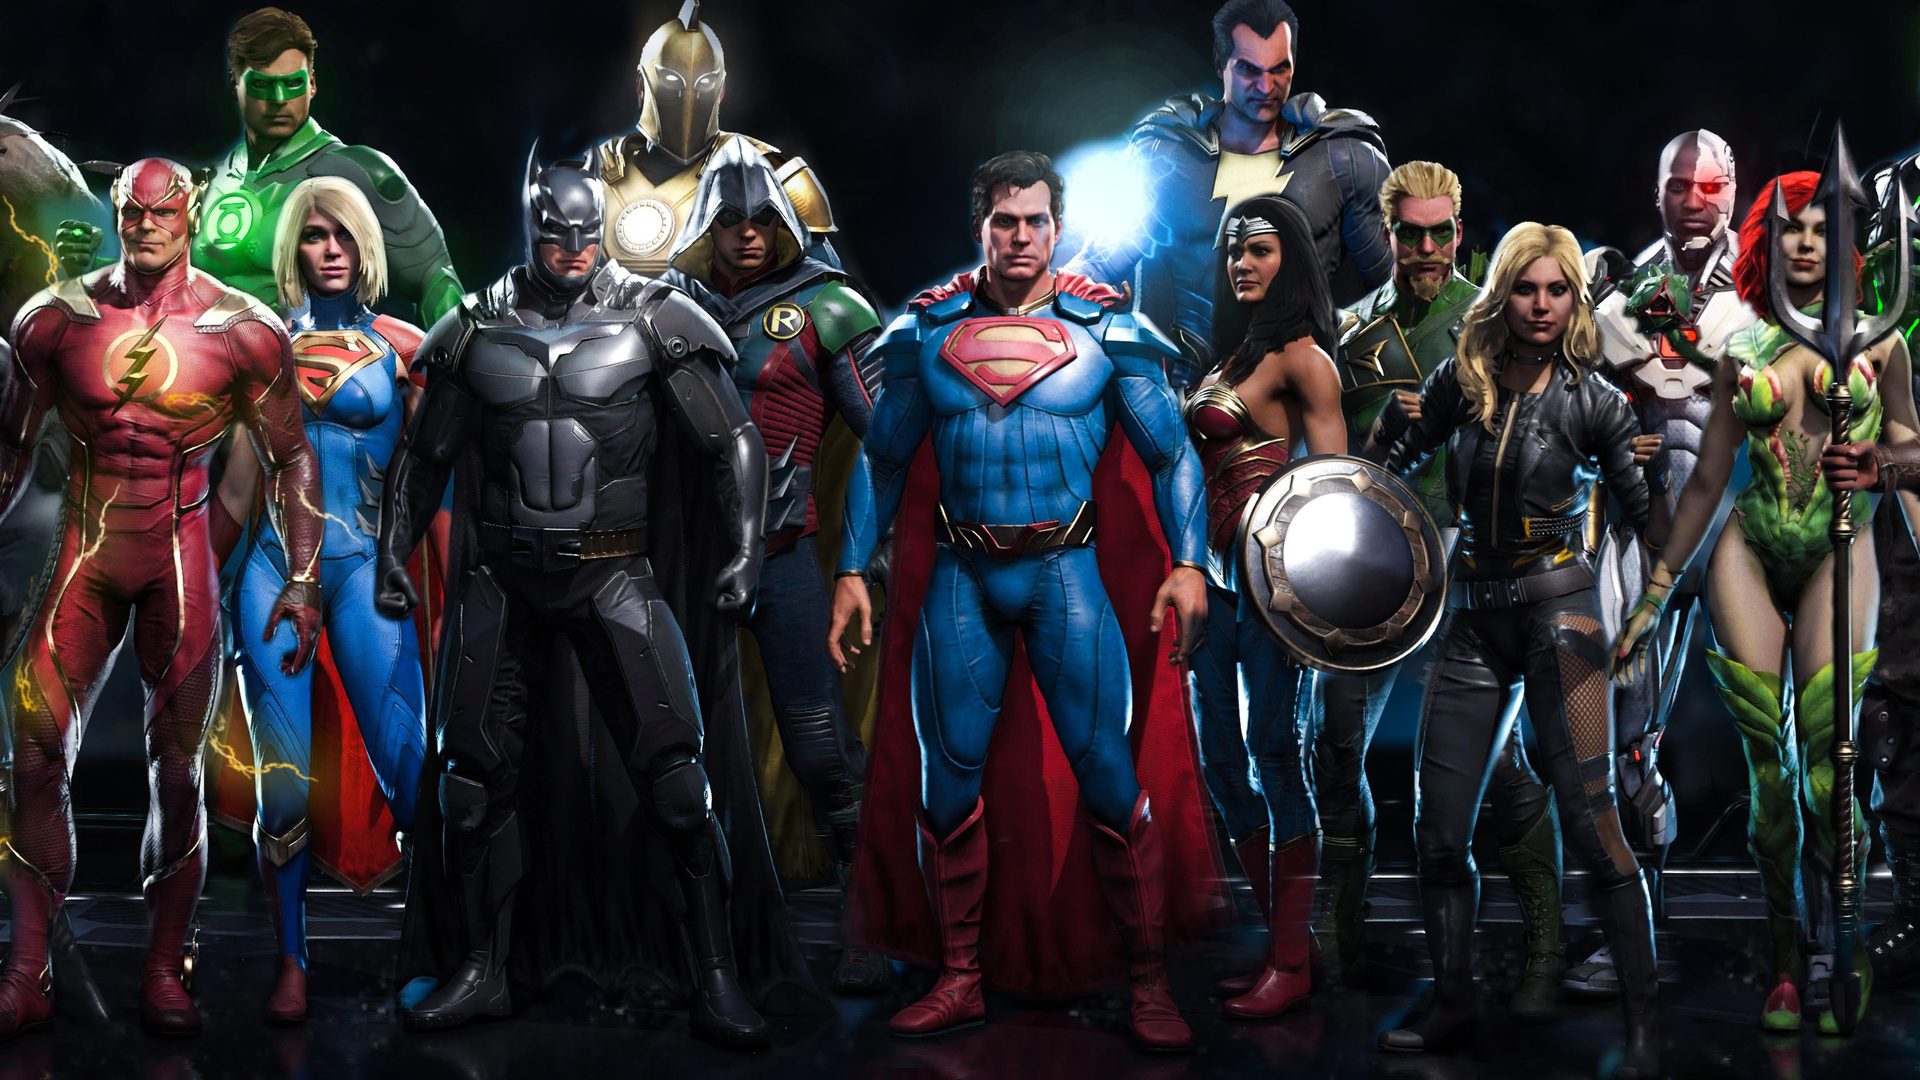 1920x1080 DC Superheroes Laptop Full HD 1080P HD 4k ...